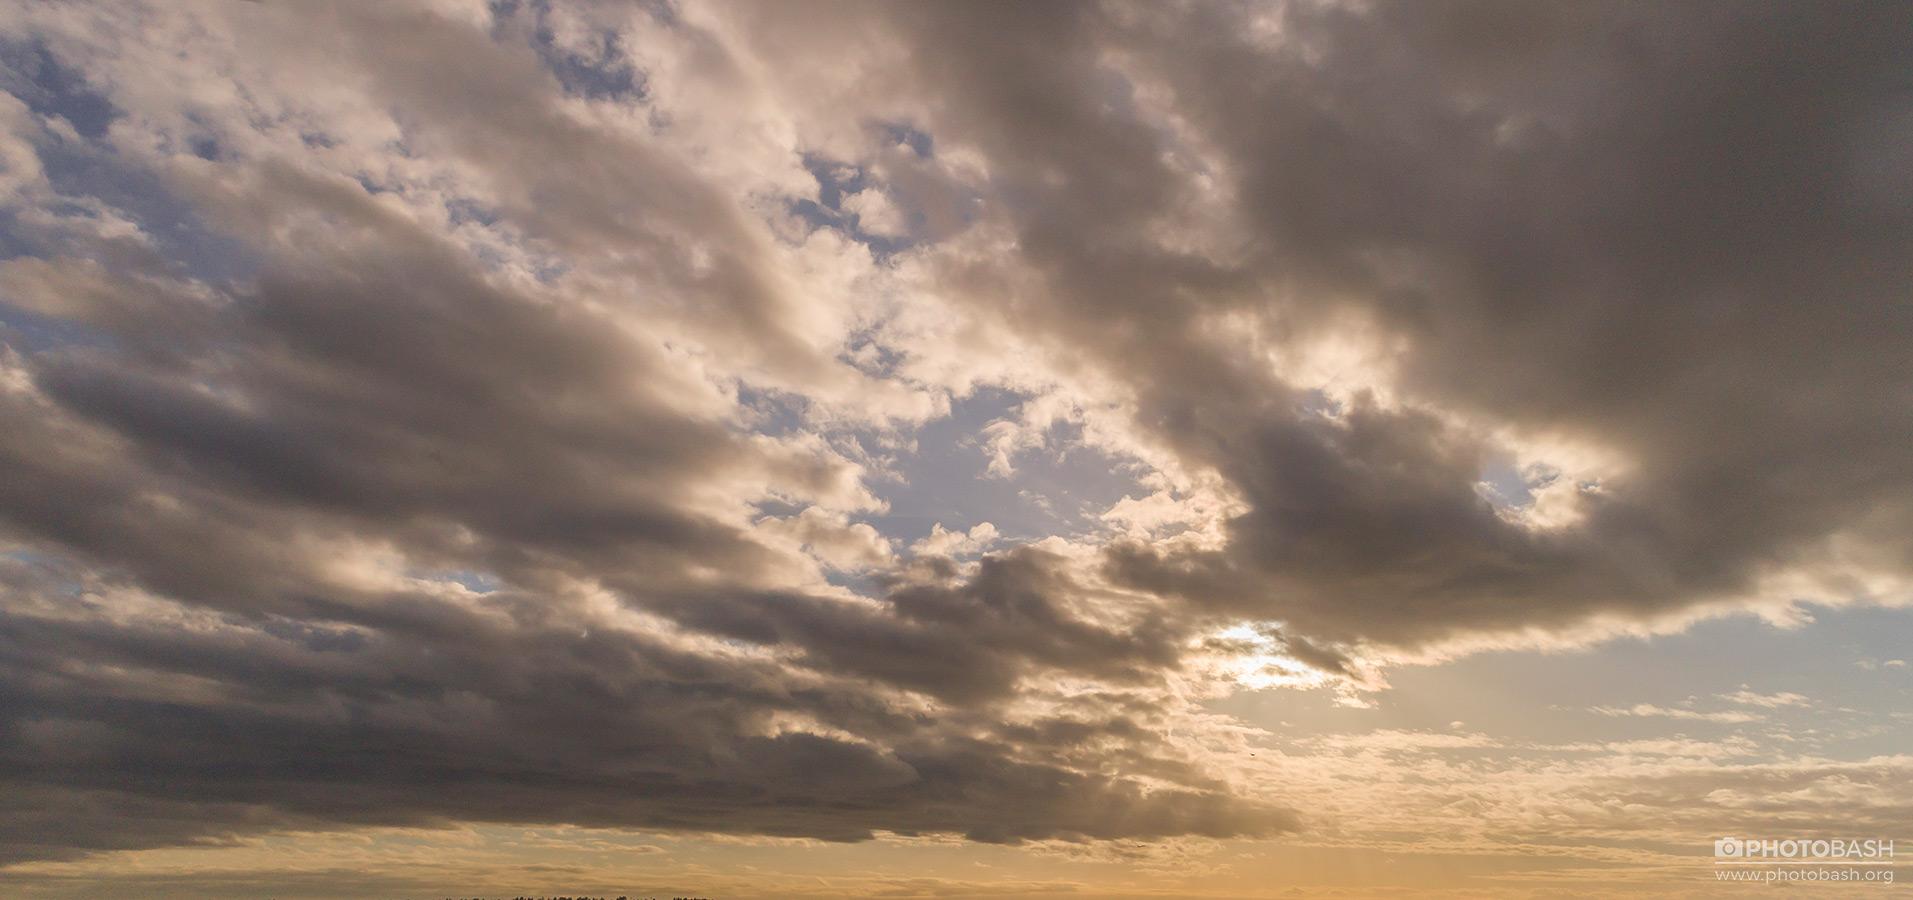 Dusk-Dawn-Sunset-Sky-Afternoon.jpg